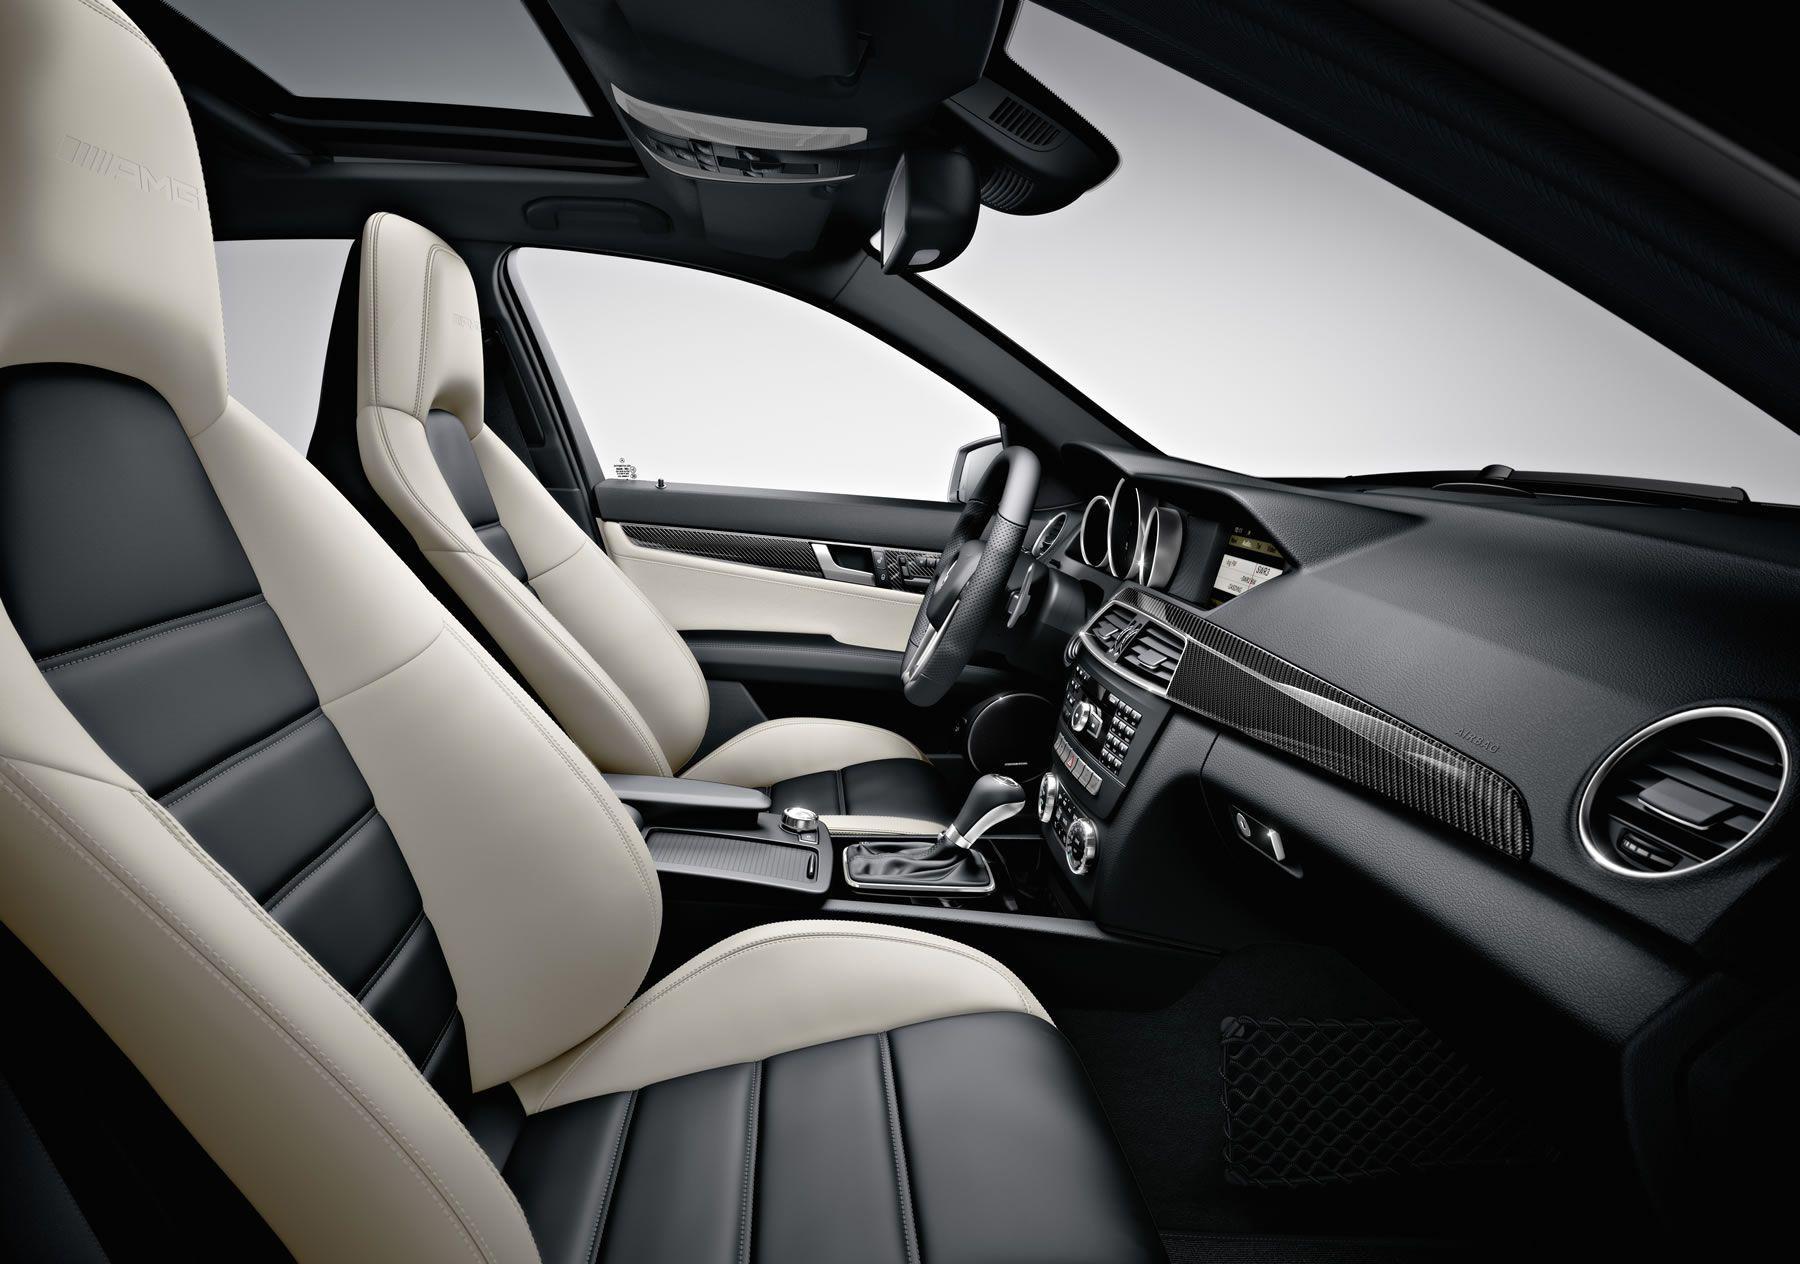 c63 amg sedan interior | Cars | Pinterest | Sedans, Mercedes benz ...